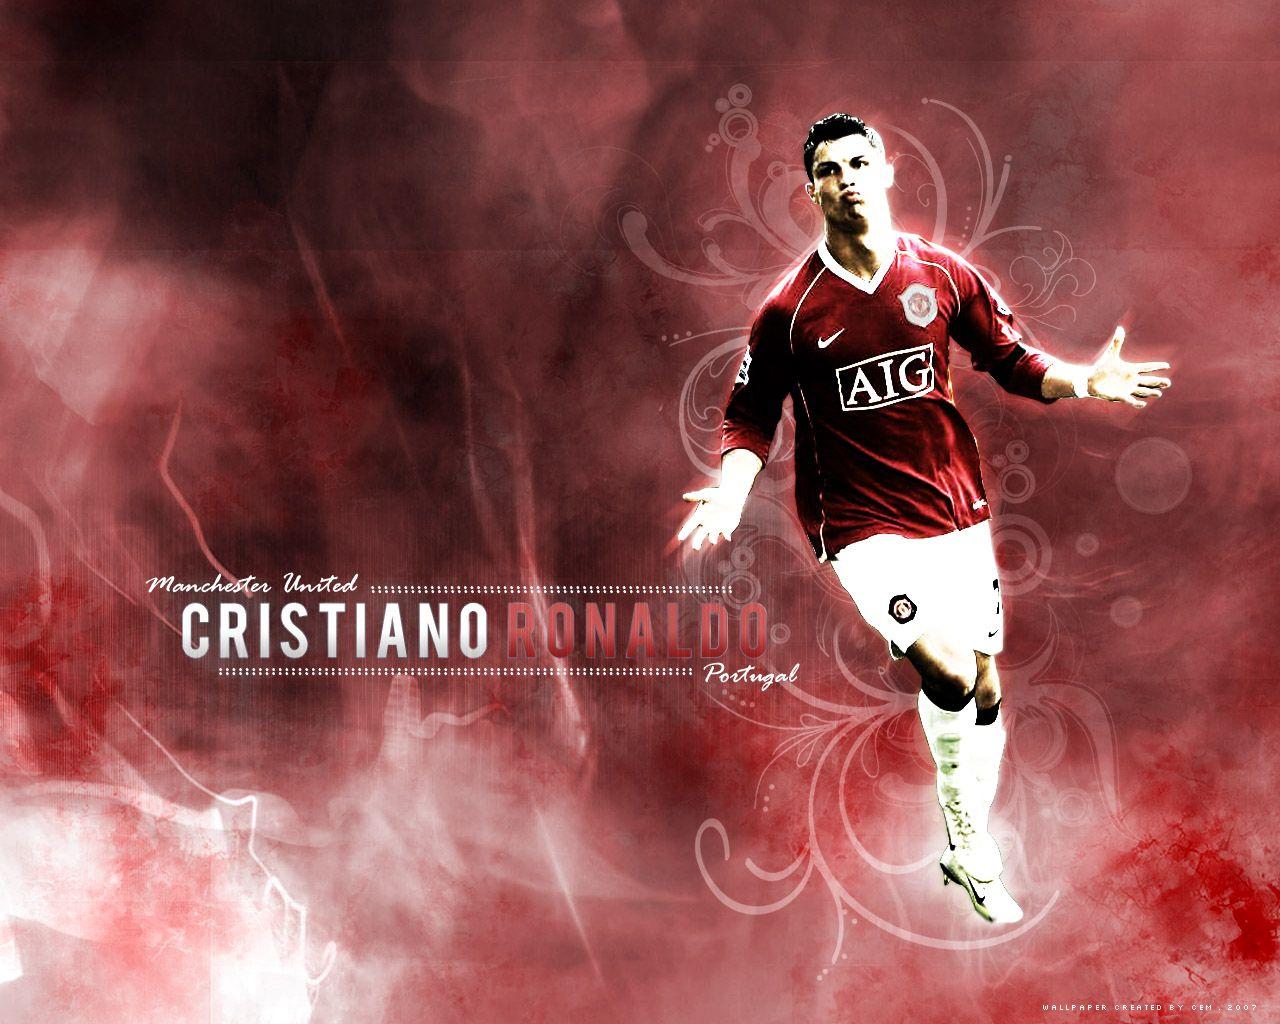 List of Nice Manchester United Wallpapers 2008 Cristiano Ronaldo | Cristiano Ronaldo: September 2008